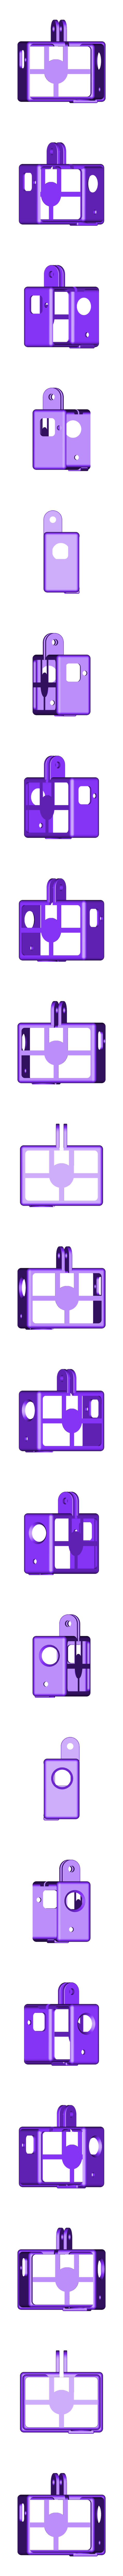 GoProHero5-Case_openConnectorstrue.stl Download free STL file Case for GoPro Hero5 (no support needed) • Design to 3D print, dede67